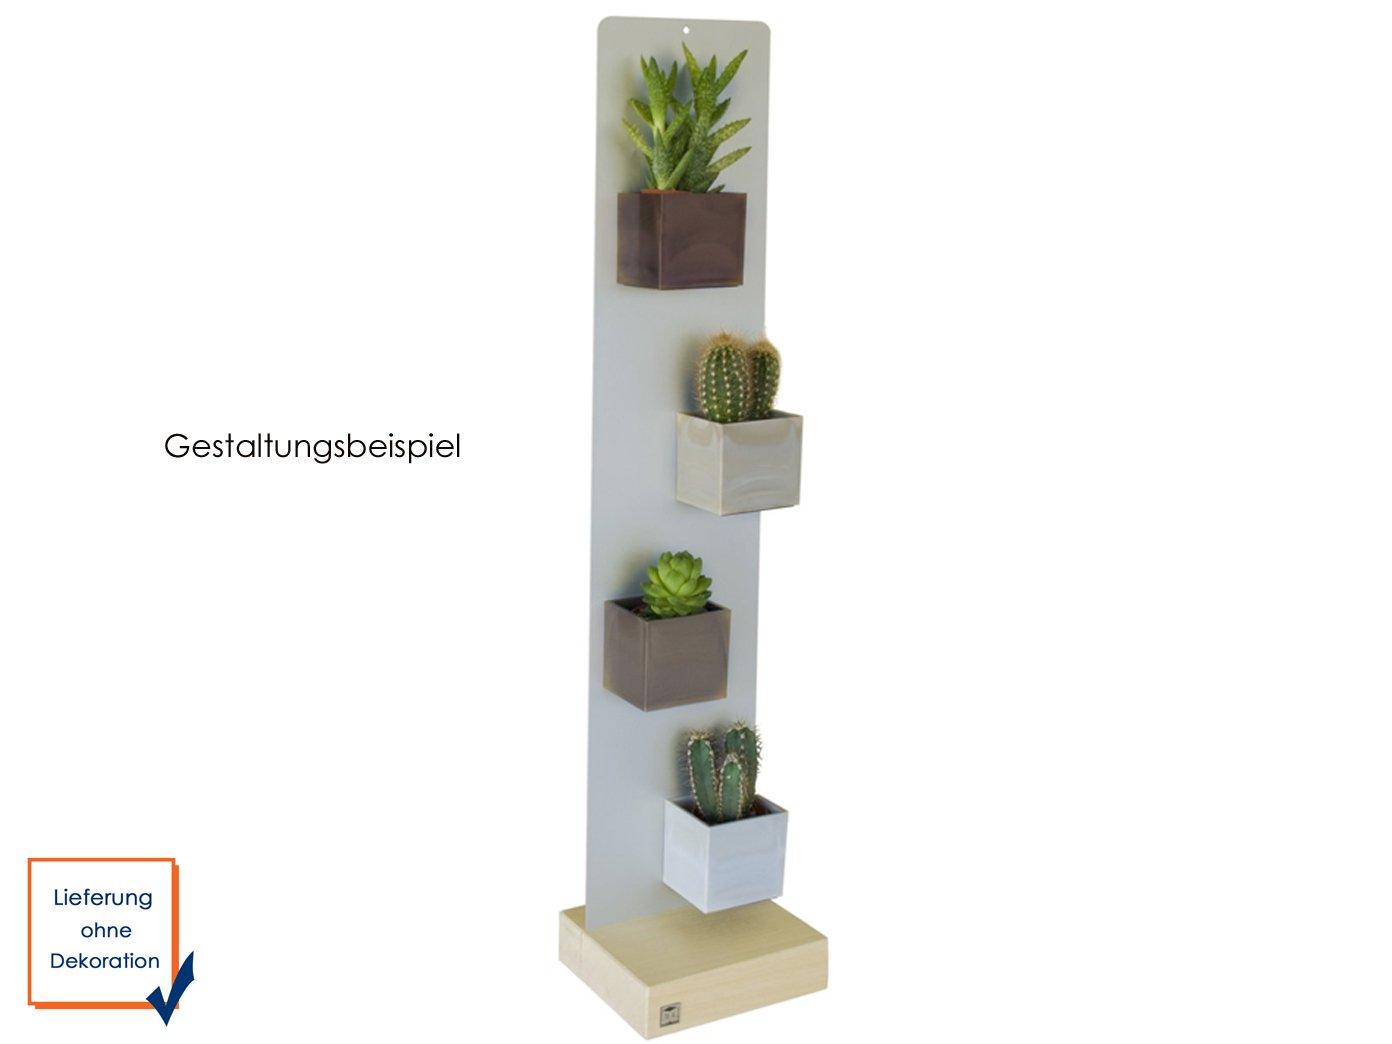 forma 3,5/cm de di/ámetro KalaMitica 50003/ /Decoraci/ón para pared /001 Magn/ético olla para cubitos de retenci/ón de pared/ Color Naranja /400/